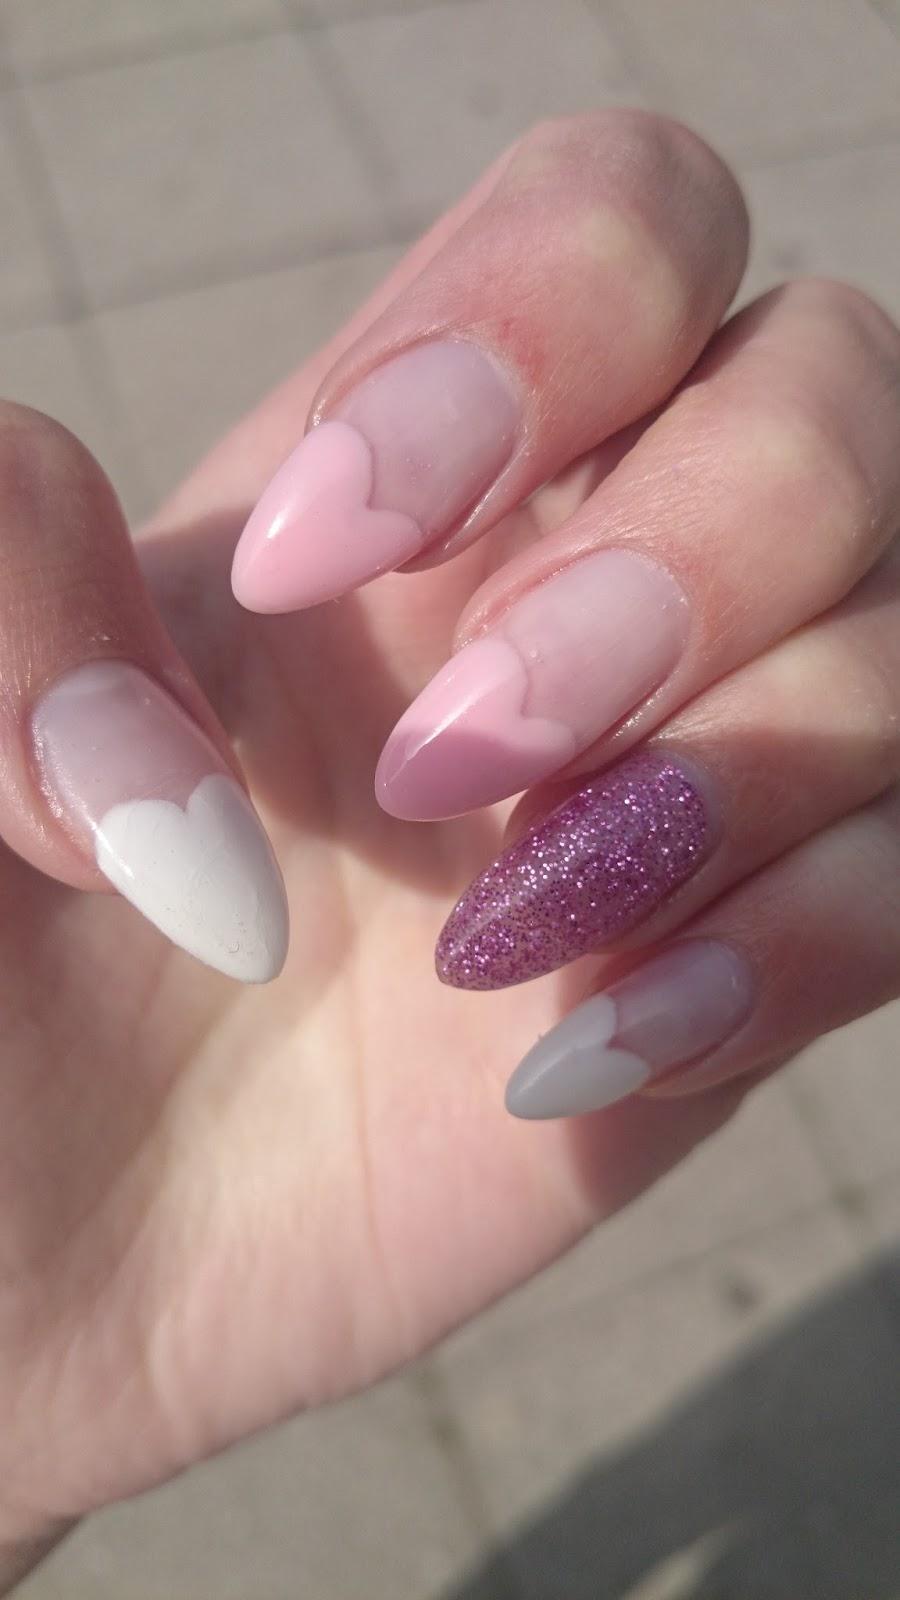 Nails: Baby pink & white nails